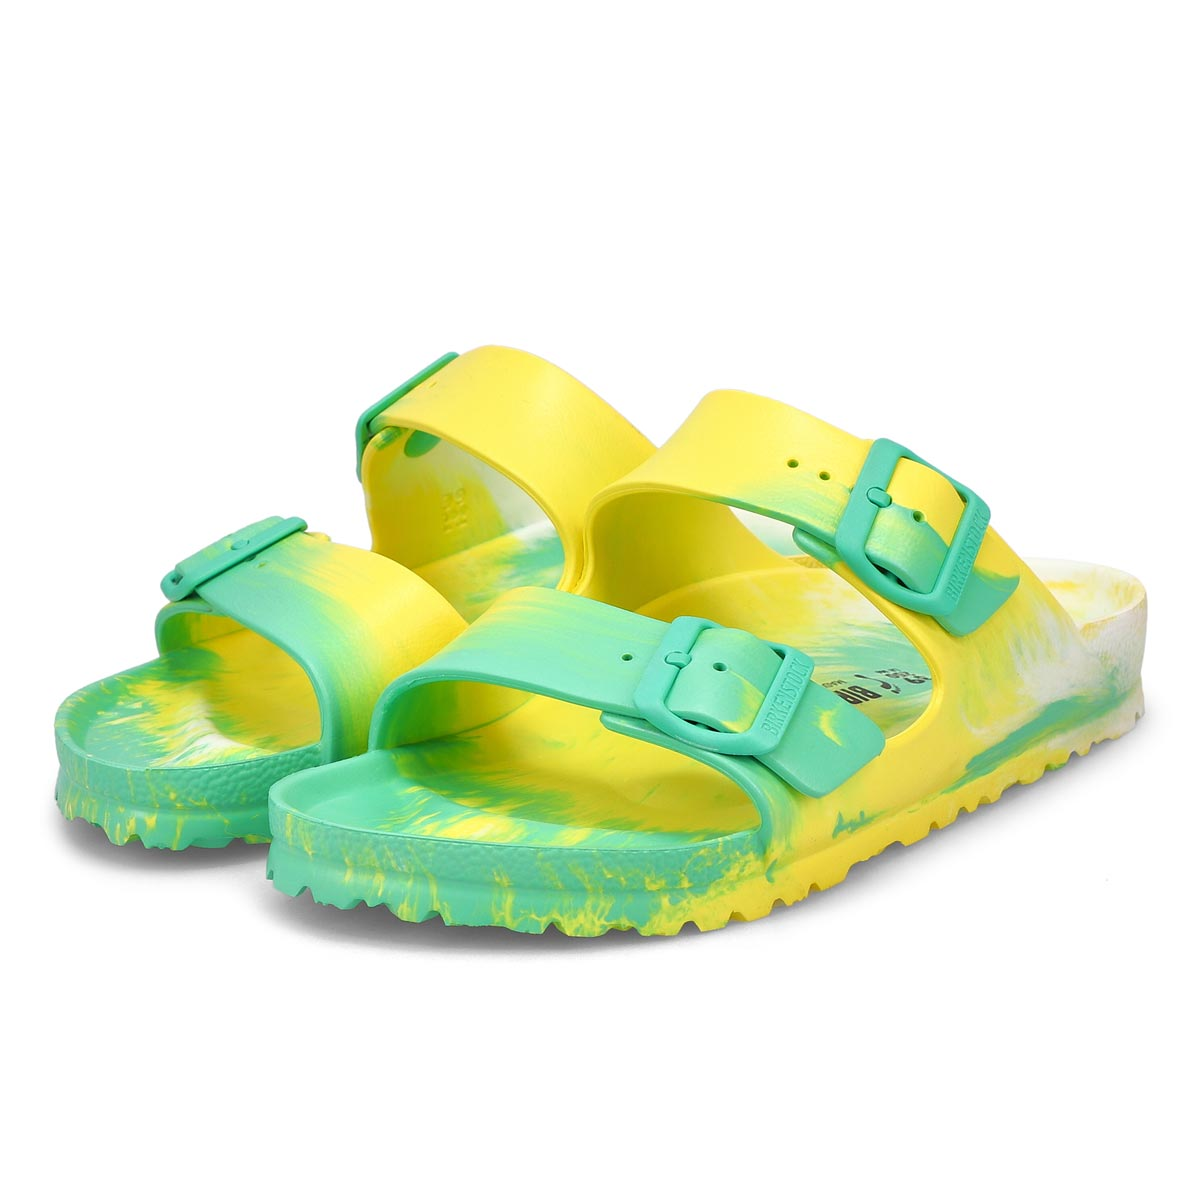 Women's Arizona EVA Sandal - Marble Green/Yellow